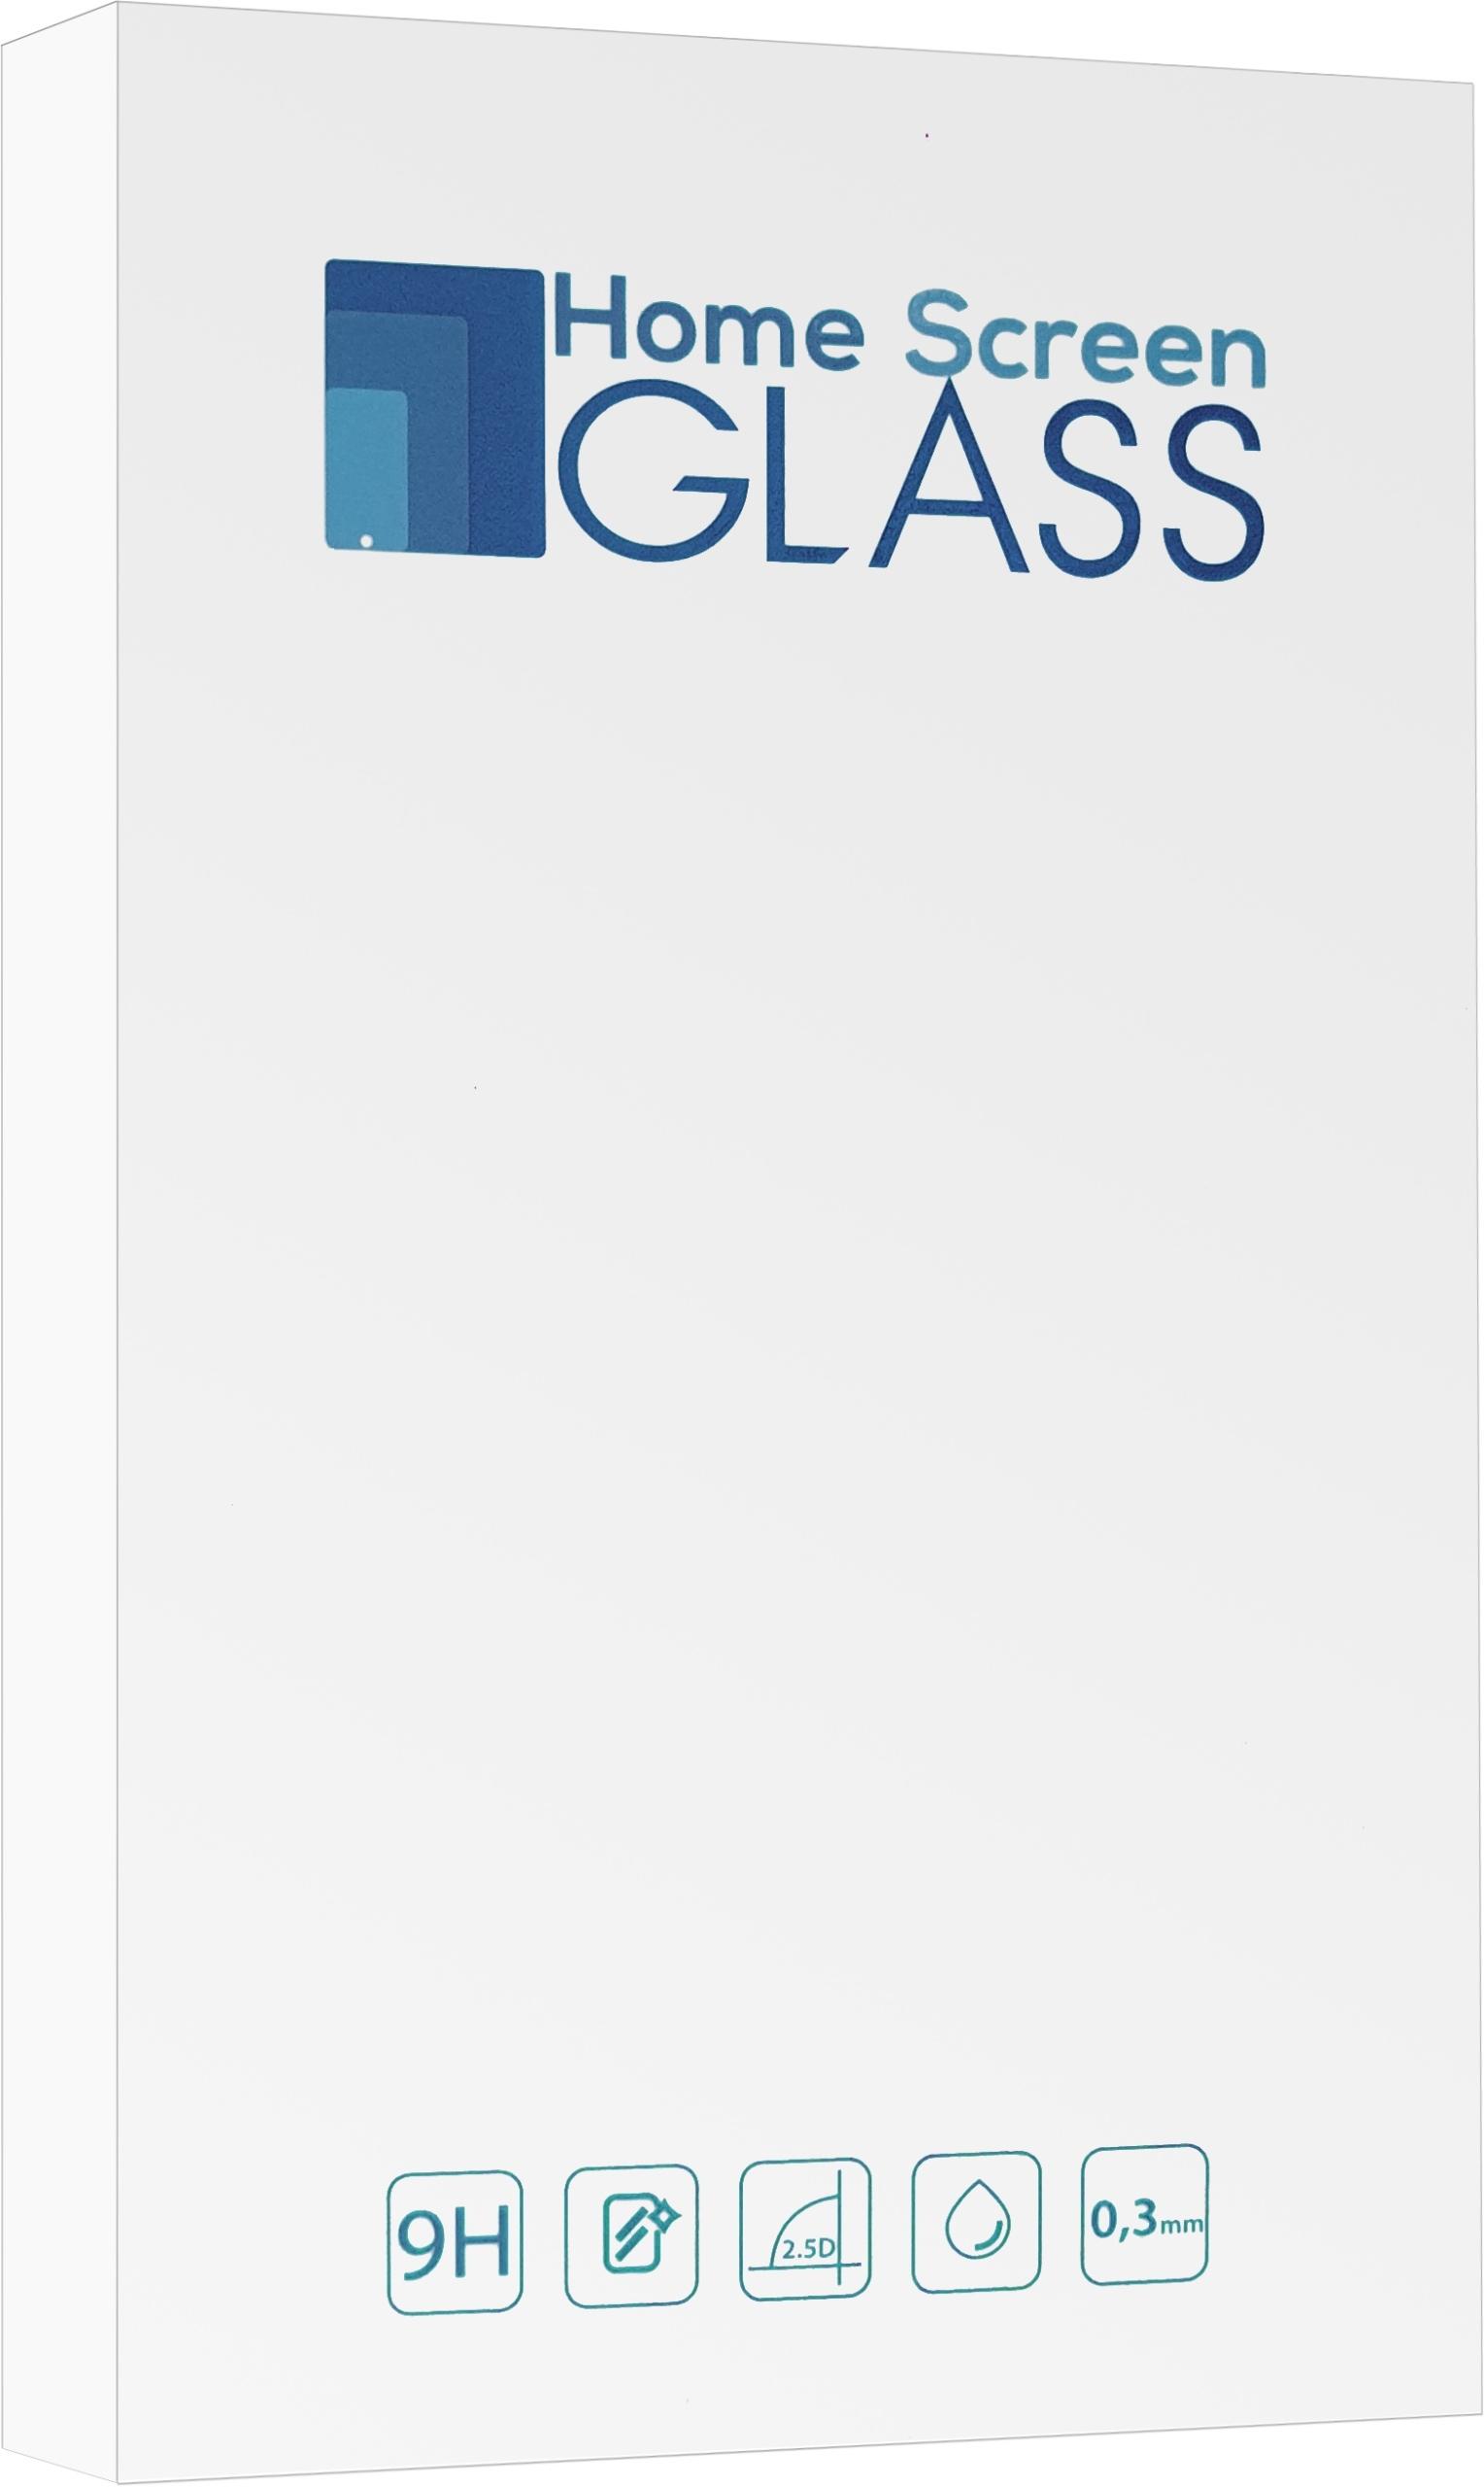 Szkło Hartowane 0,3MM Na Ekran Hs Glass Do Lg G6